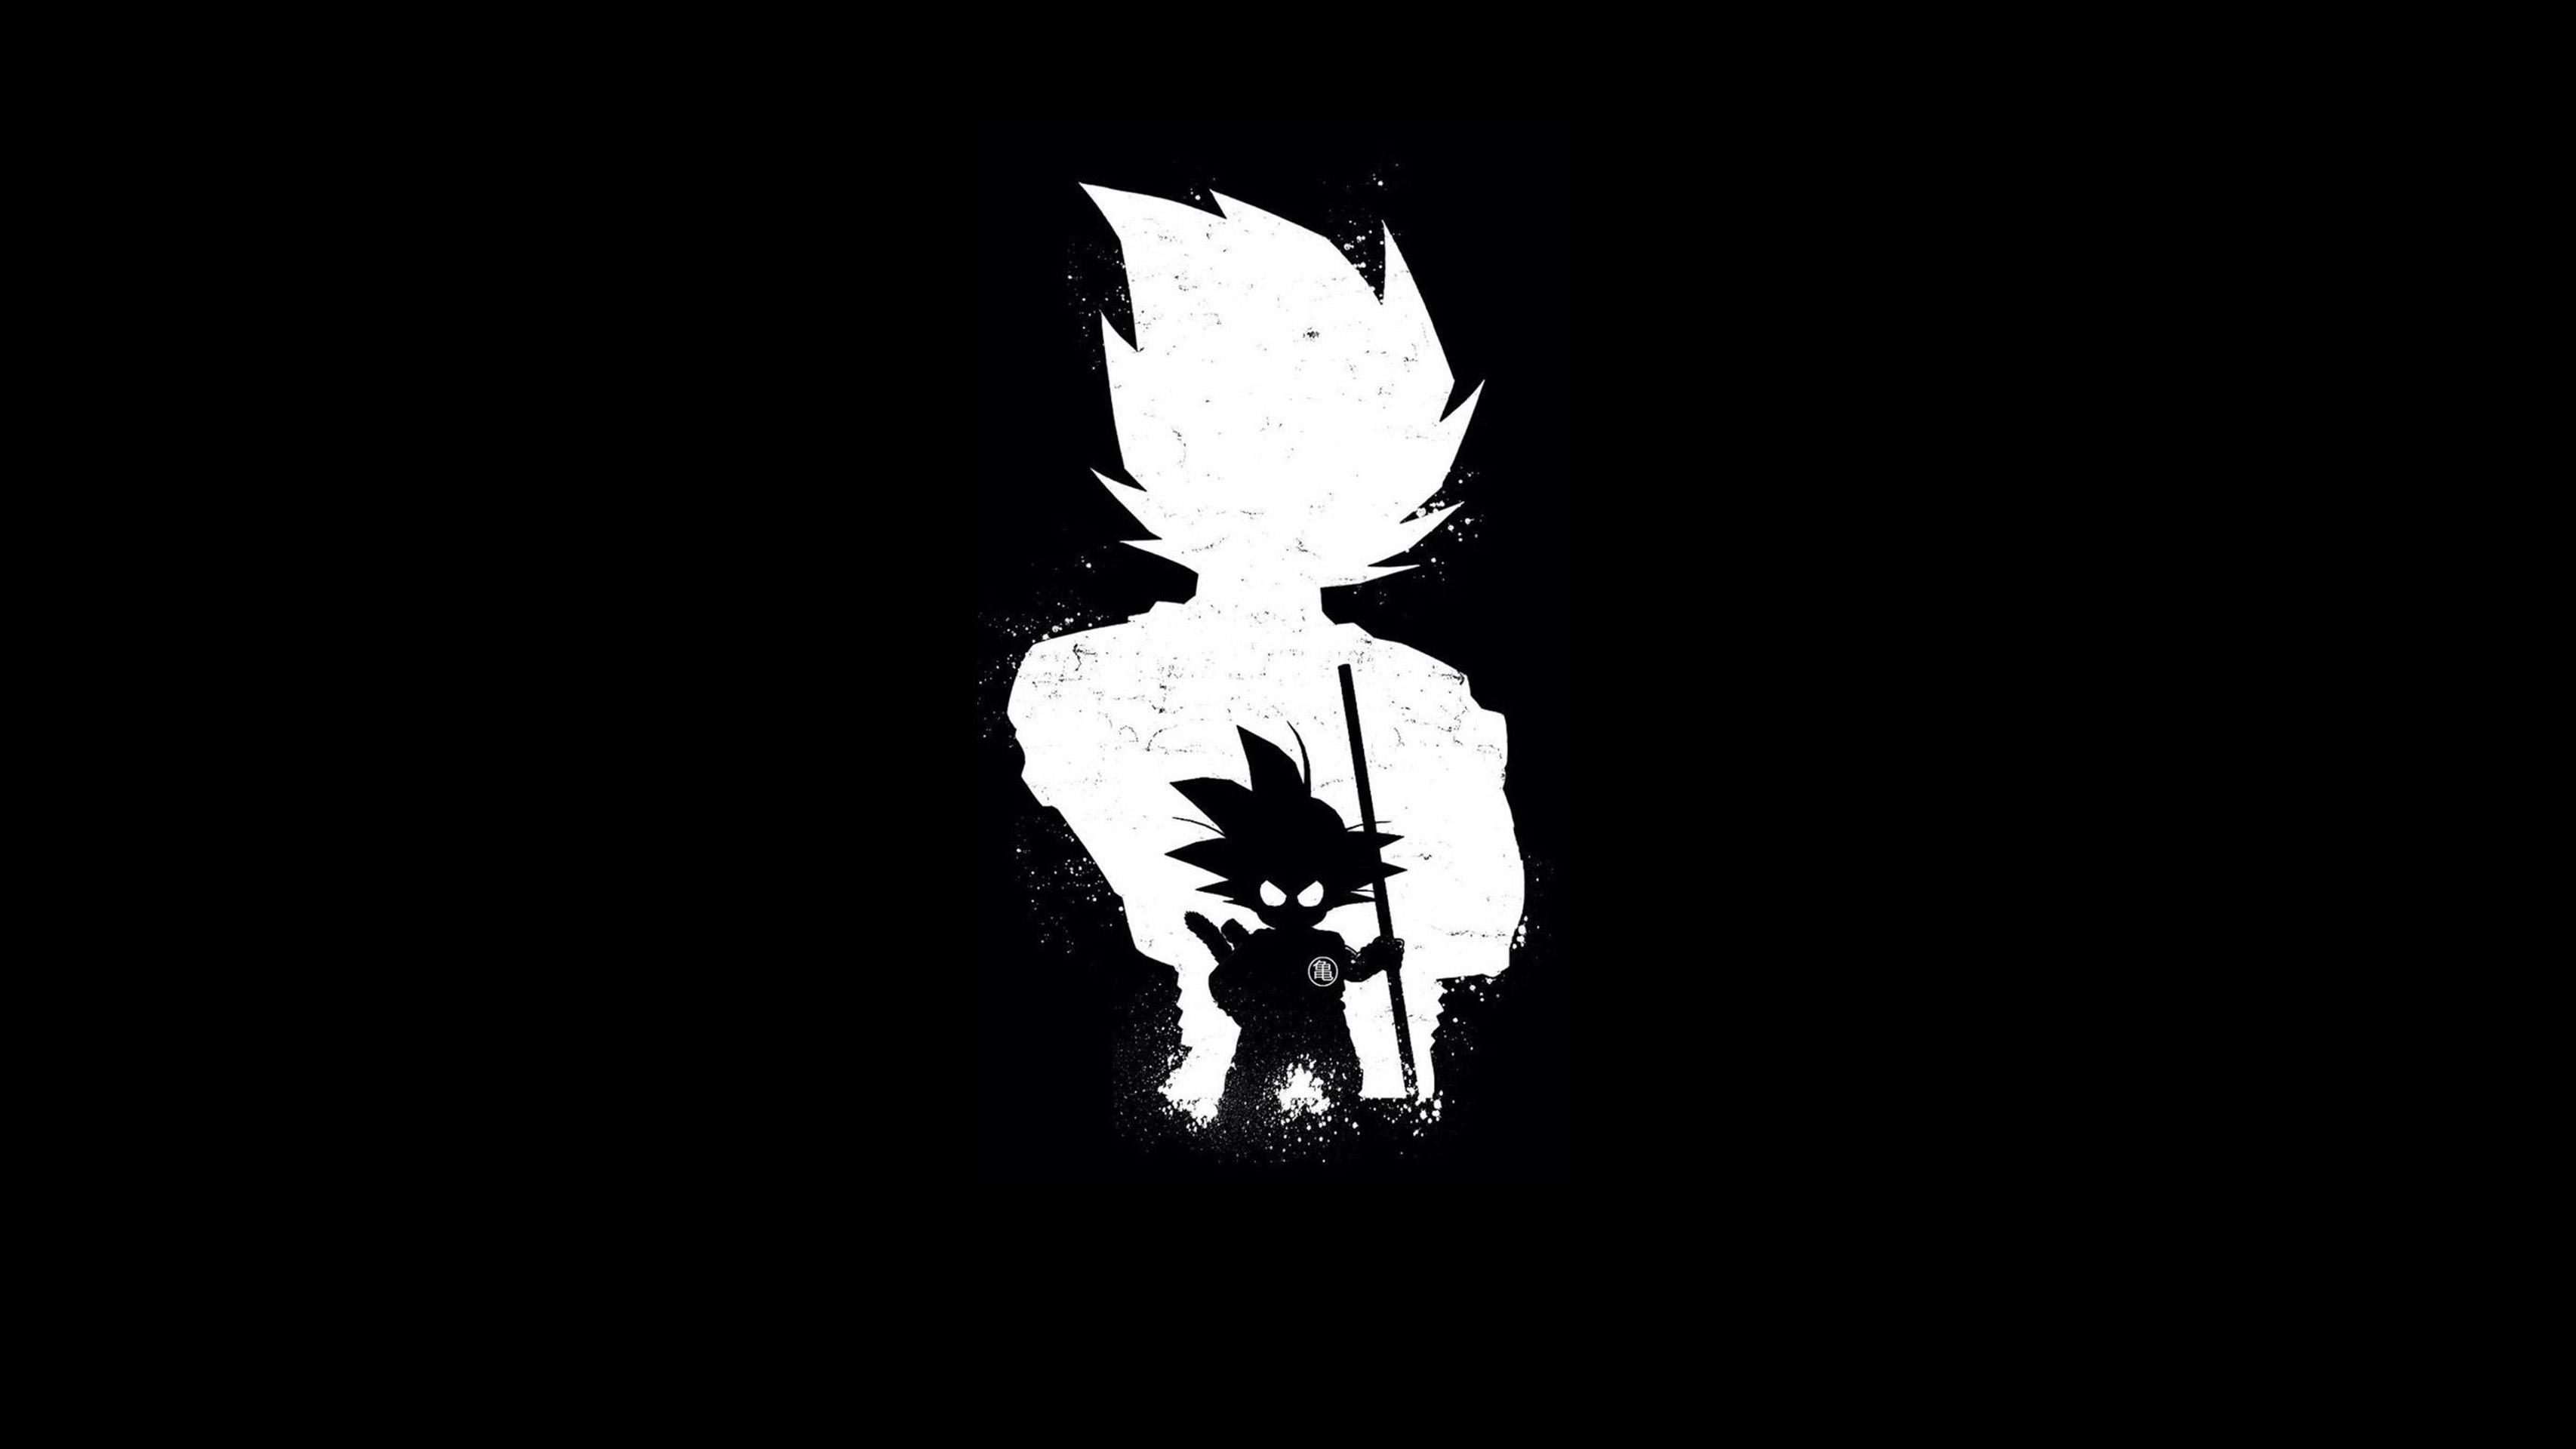 goku anime dark black